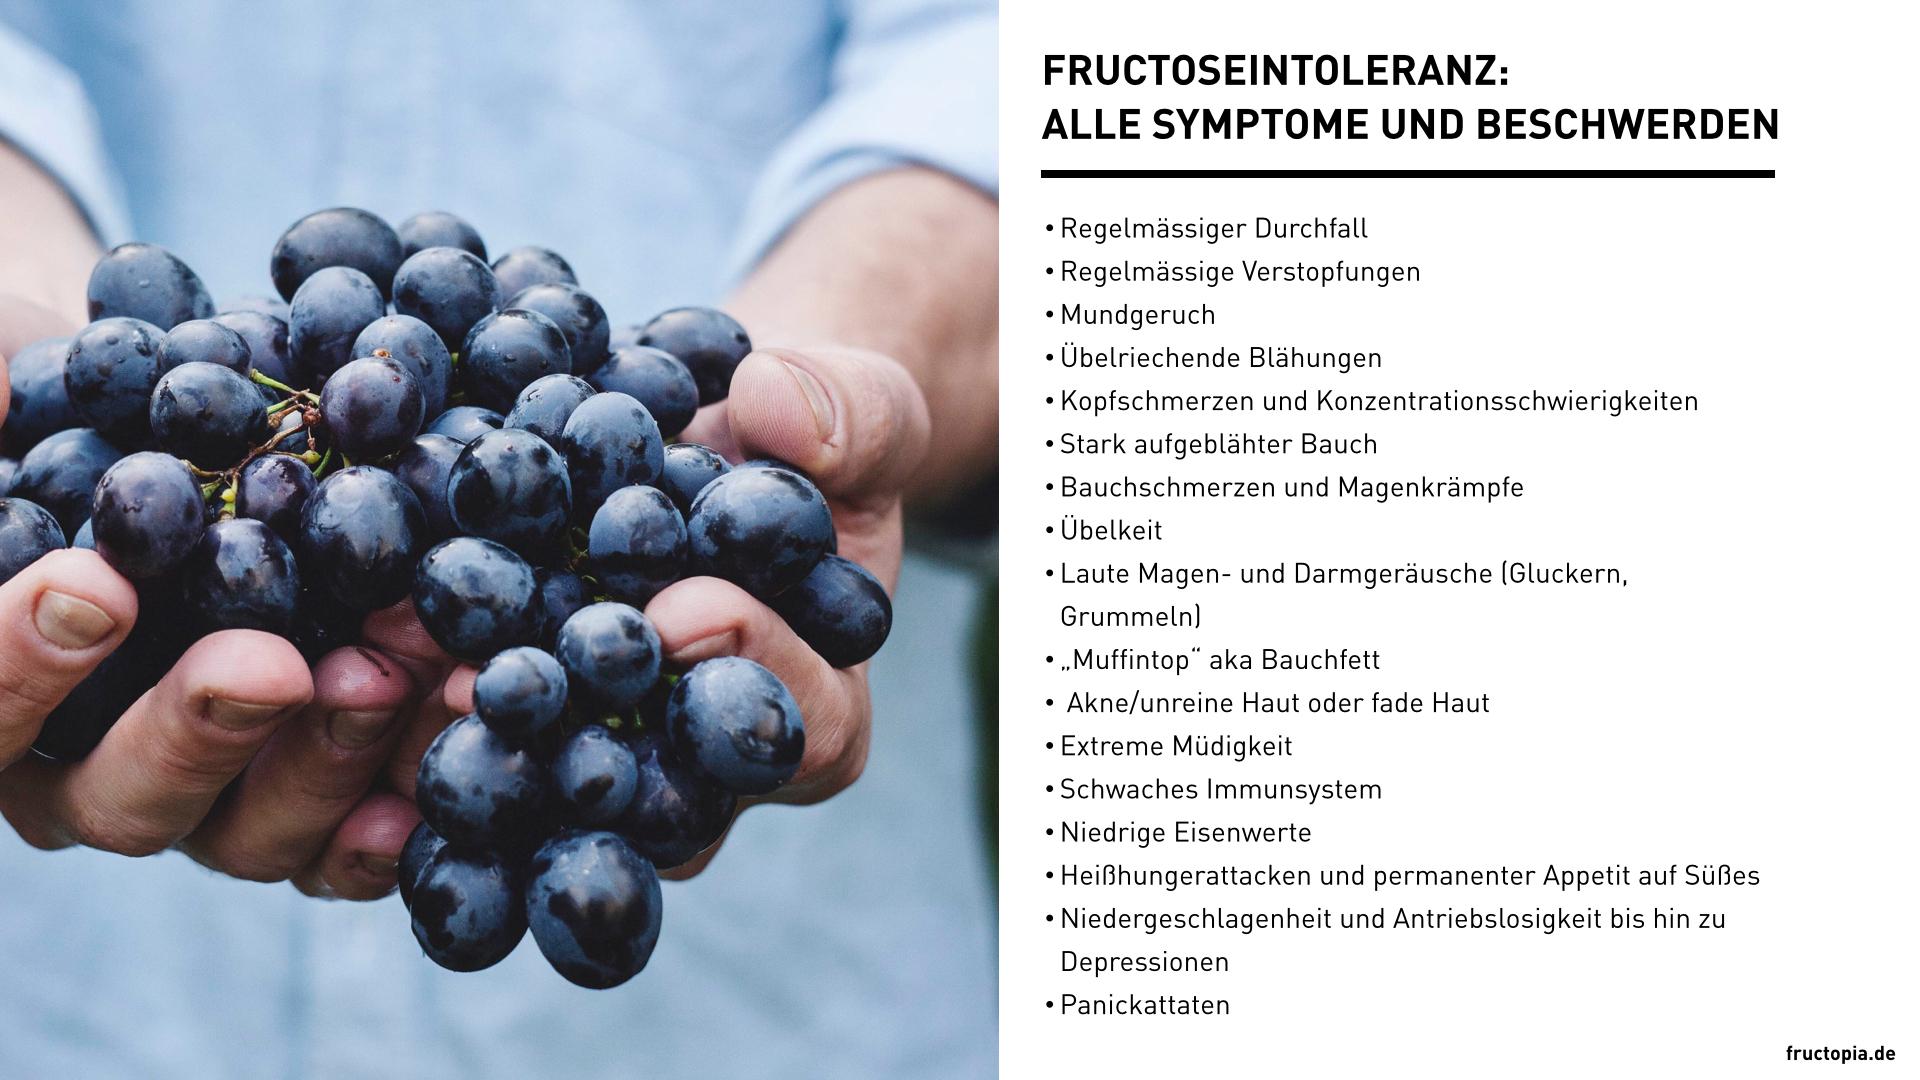 Fructoseintoleranz Symptome Und Beschwerden Fructopiade